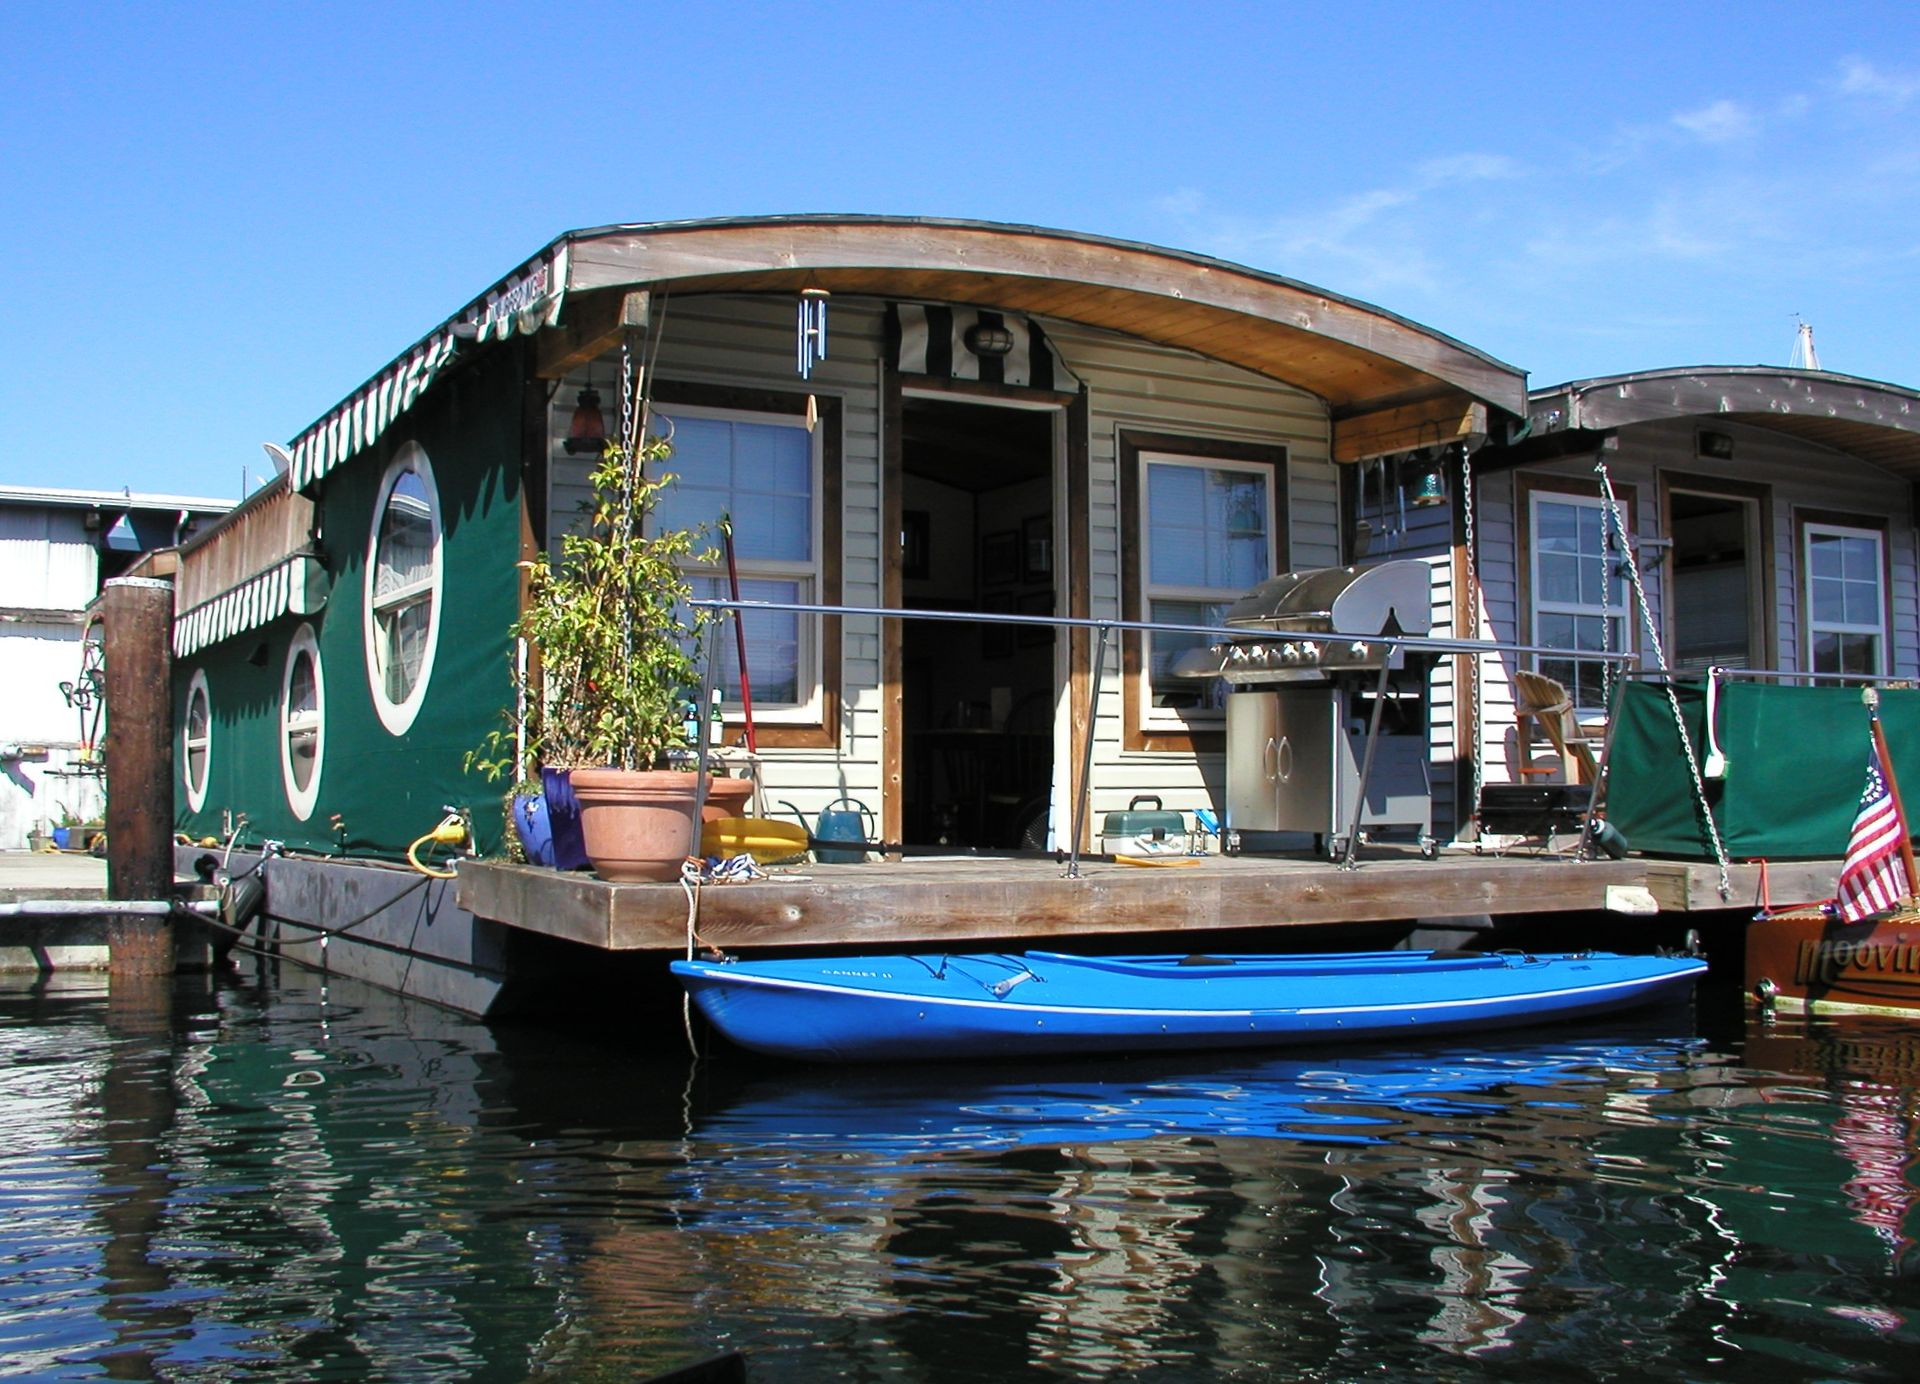 houseboat wikipedia. Black Bedroom Furniture Sets. Home Design Ideas